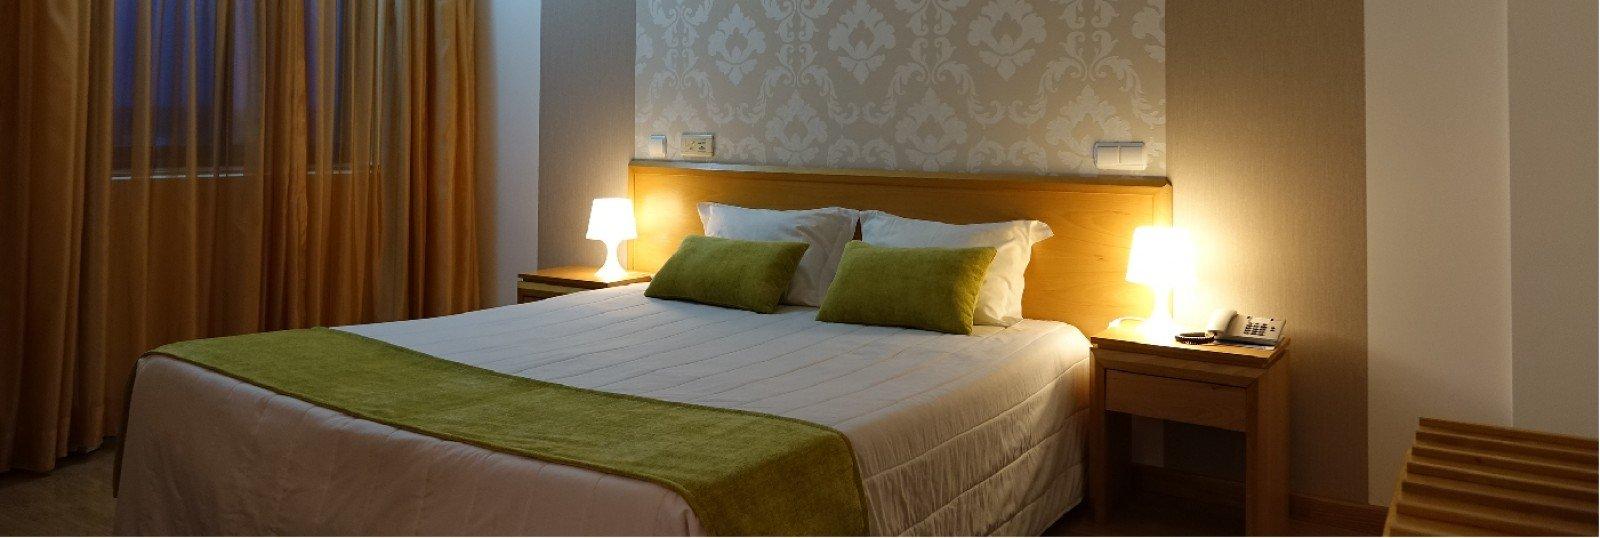 Hotel Eurosol Alcanena - double room